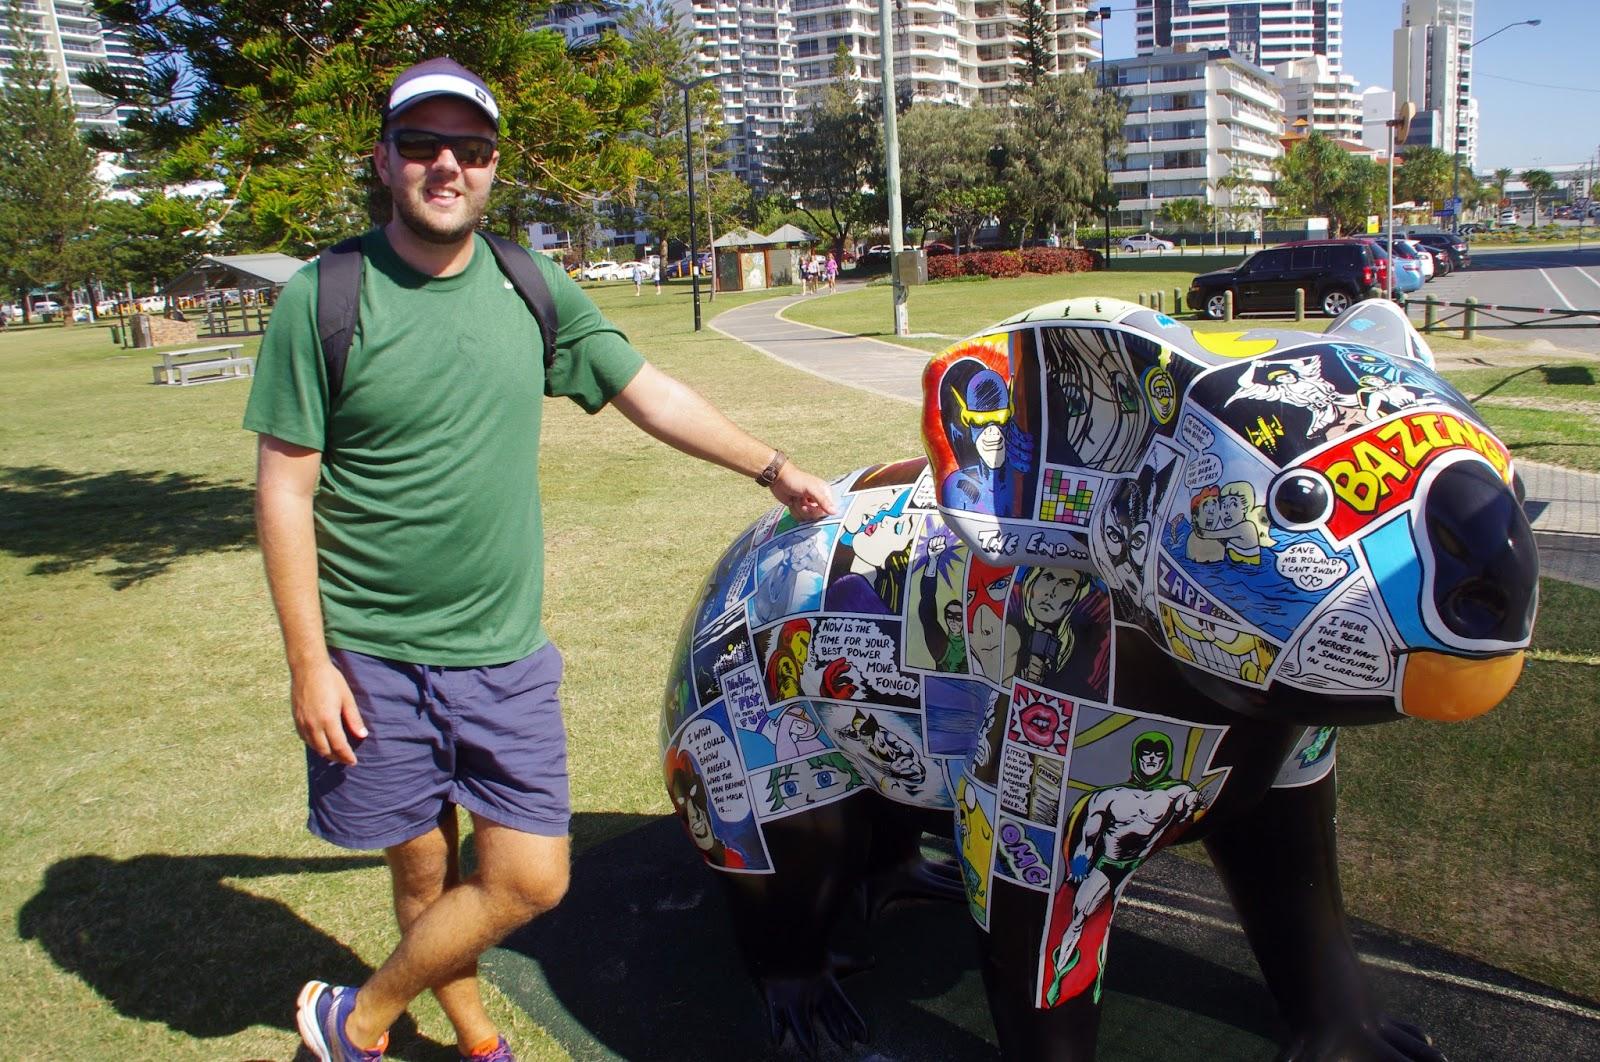 Broadbeach Walkway Guy with Koala Statue